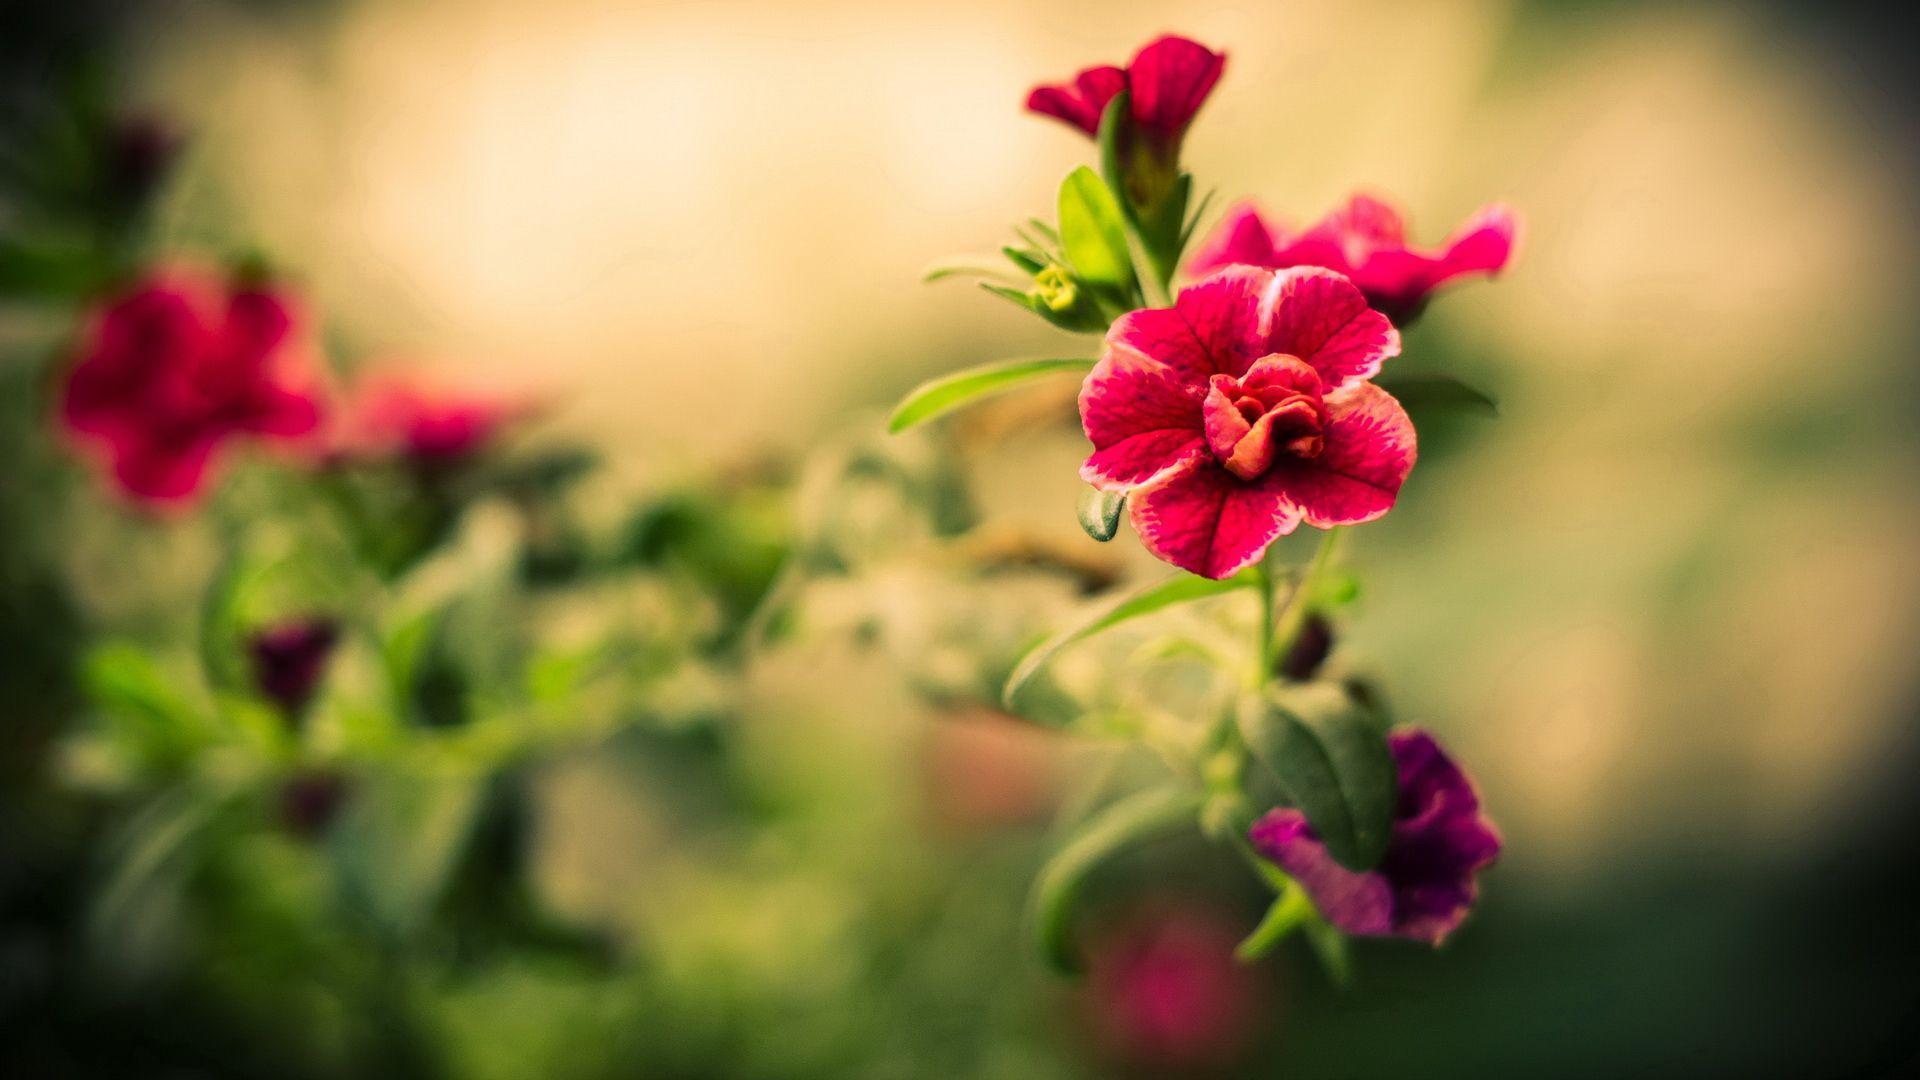 Best of Flowers HD Wallpapers , Top Free Best of Flowers HD